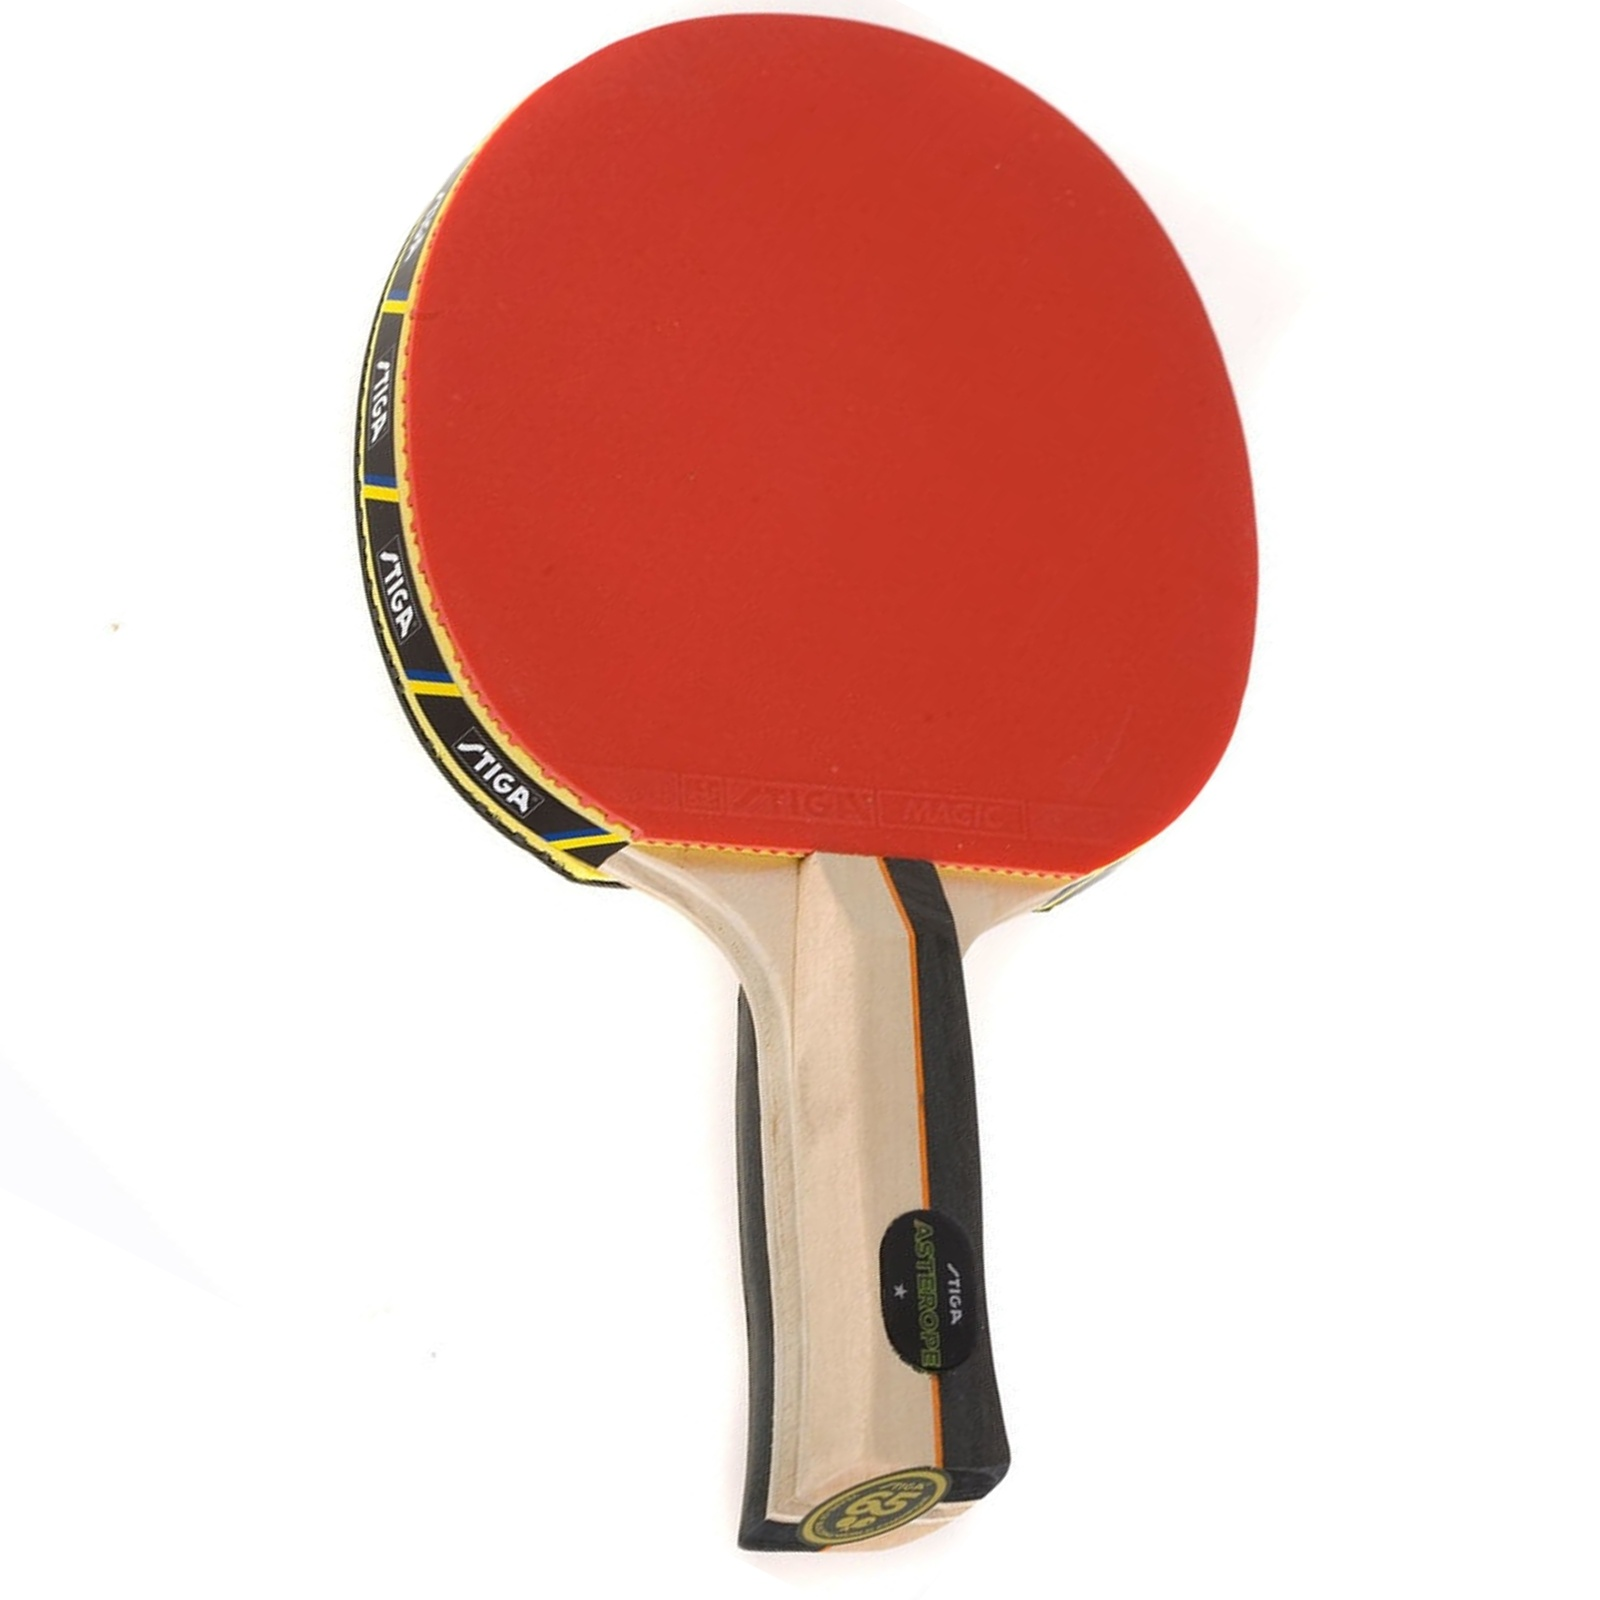 Pálka na stolní tenis STIGA Alcor